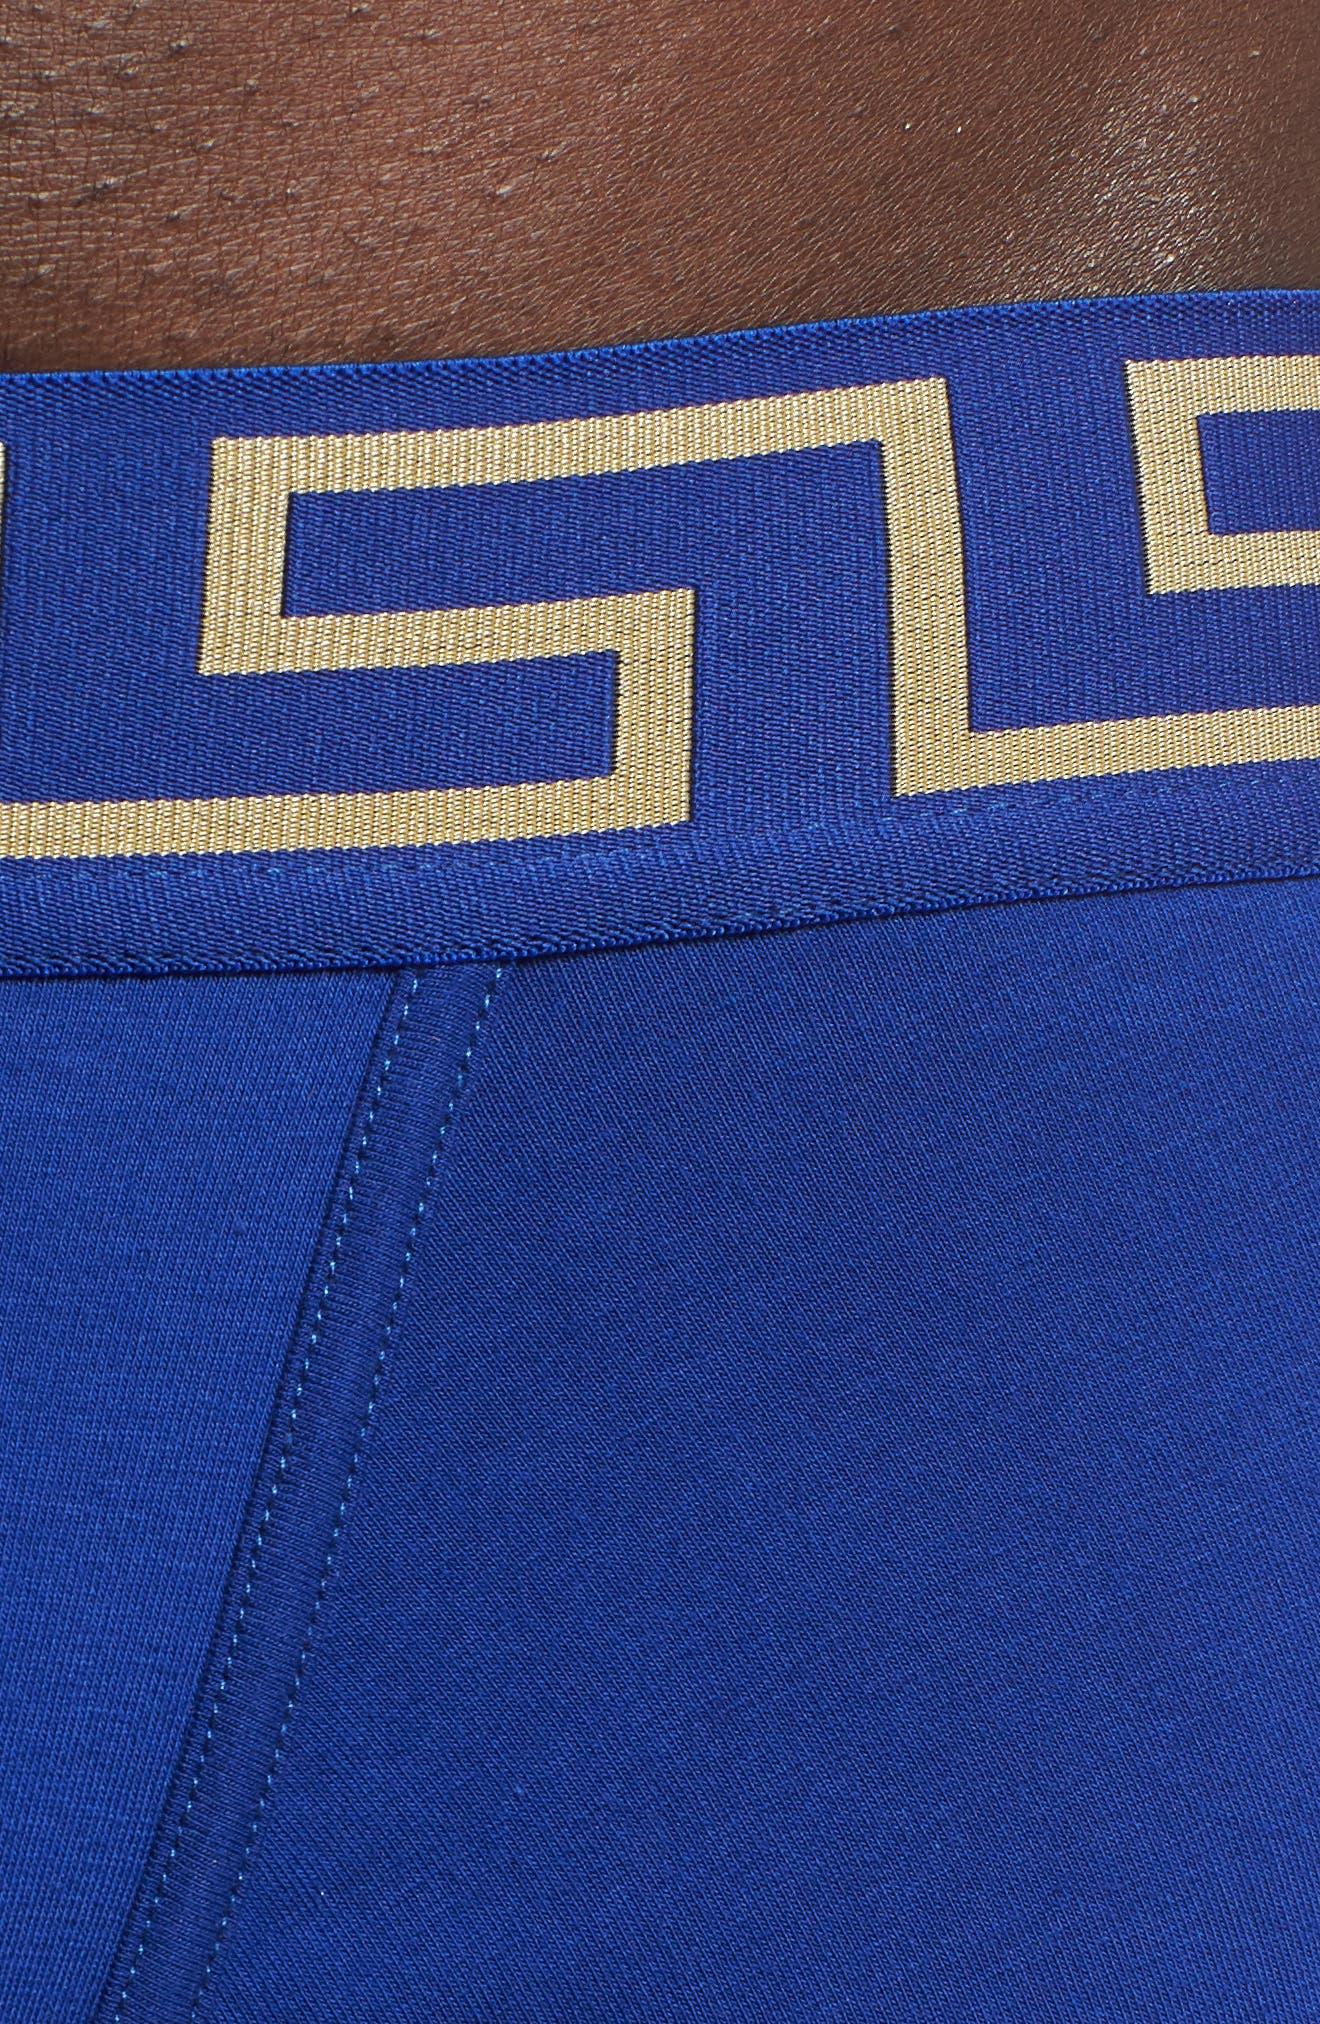 Versace Collection Low Rise Trunks,                             Alternate thumbnail 4, color,                             Bluette/ Gold